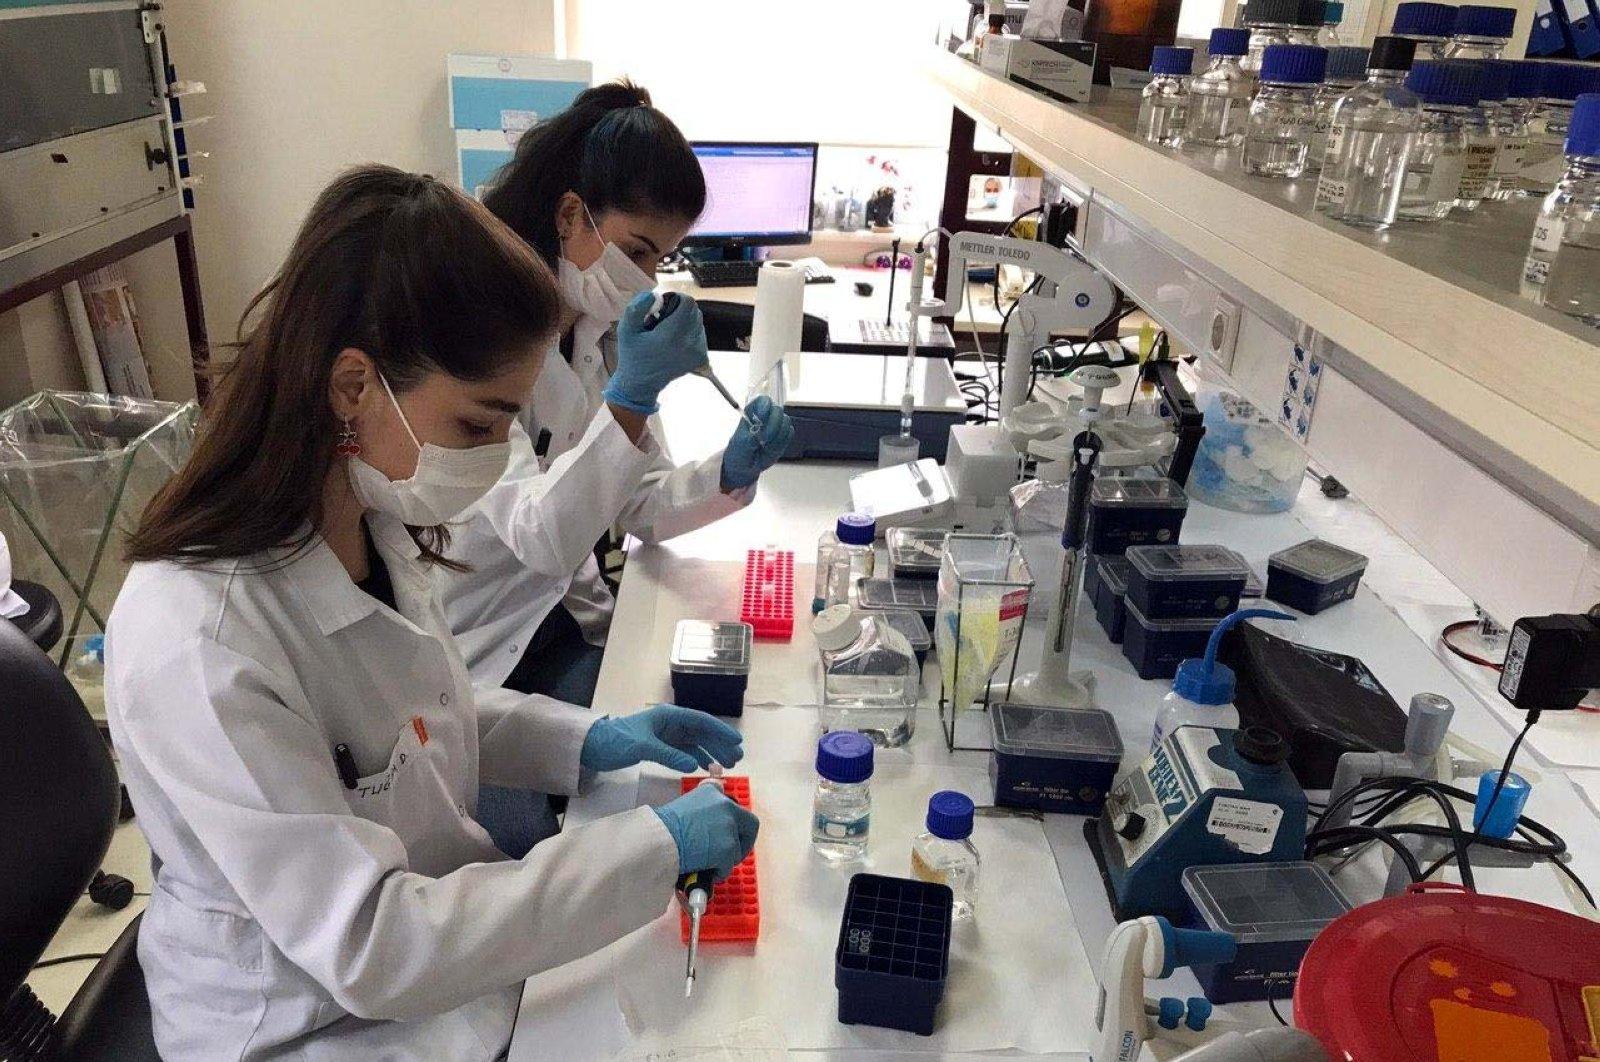 Researchers work at a lab to develop a coronavirus vaccine in Kocaeli, northwestern Turkey, Aug. 11, 2020. (AA Photo)